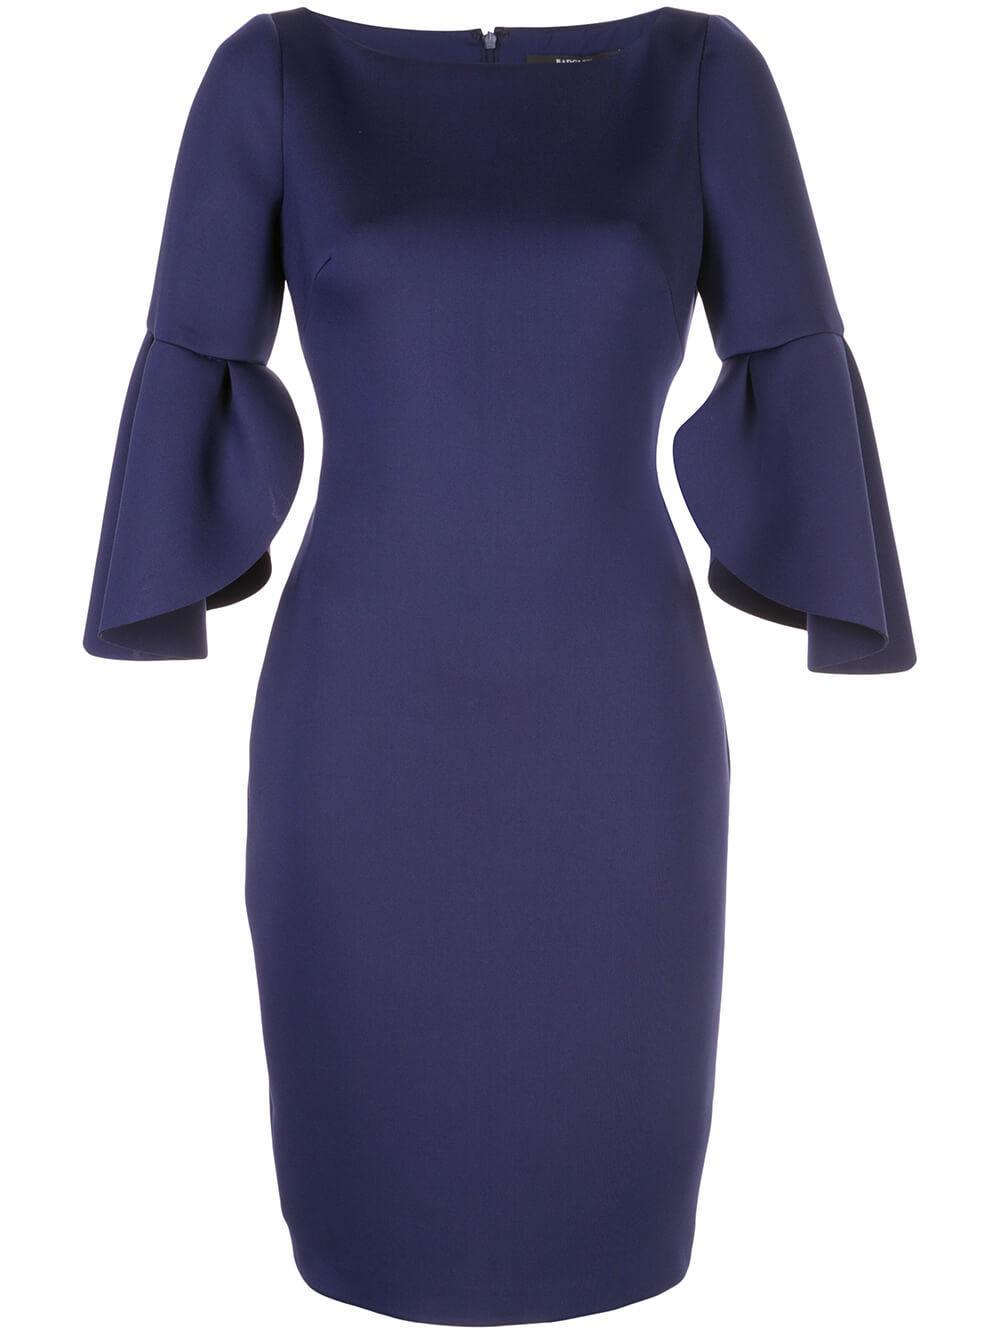 Tulip Sleeve Cocktail Dress Item # SC2492